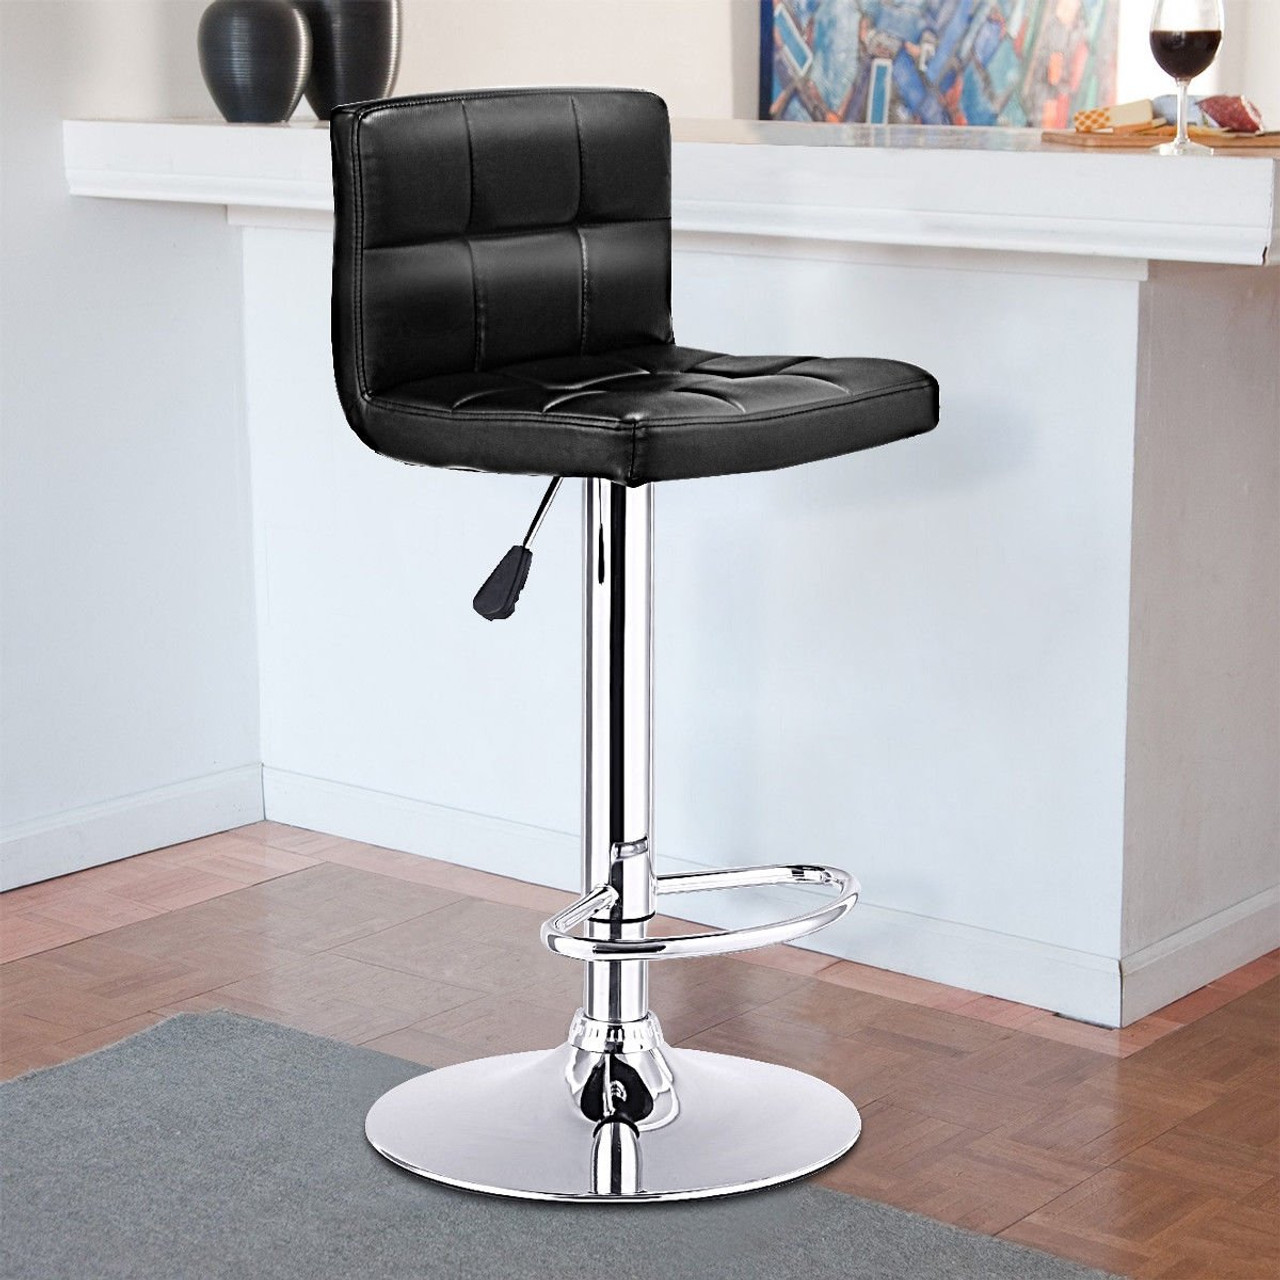 Cw Hw65633bk 1 Pc Bar Stool Swivel Adjustable Pu Leather Barstools Bistro Pub Chair Black